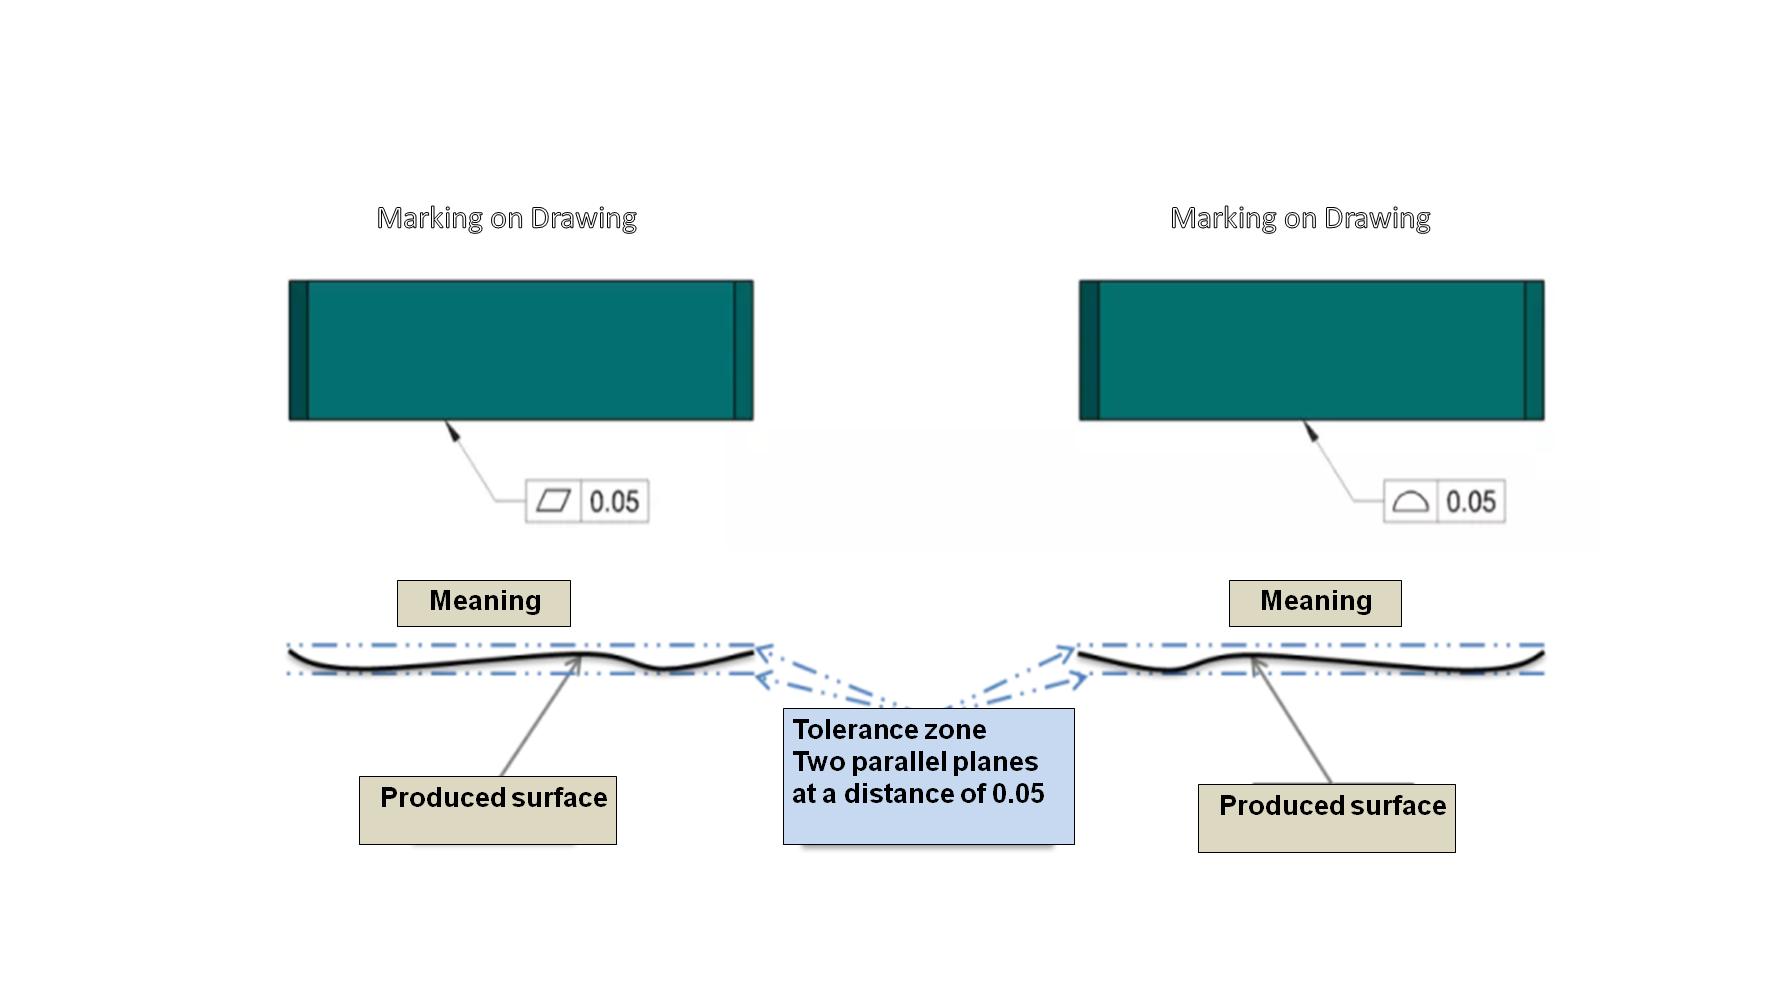 Flatness vs profile controls tes rnd totm160918 graphics flatness vs profile controlsg malvernweather Gallery